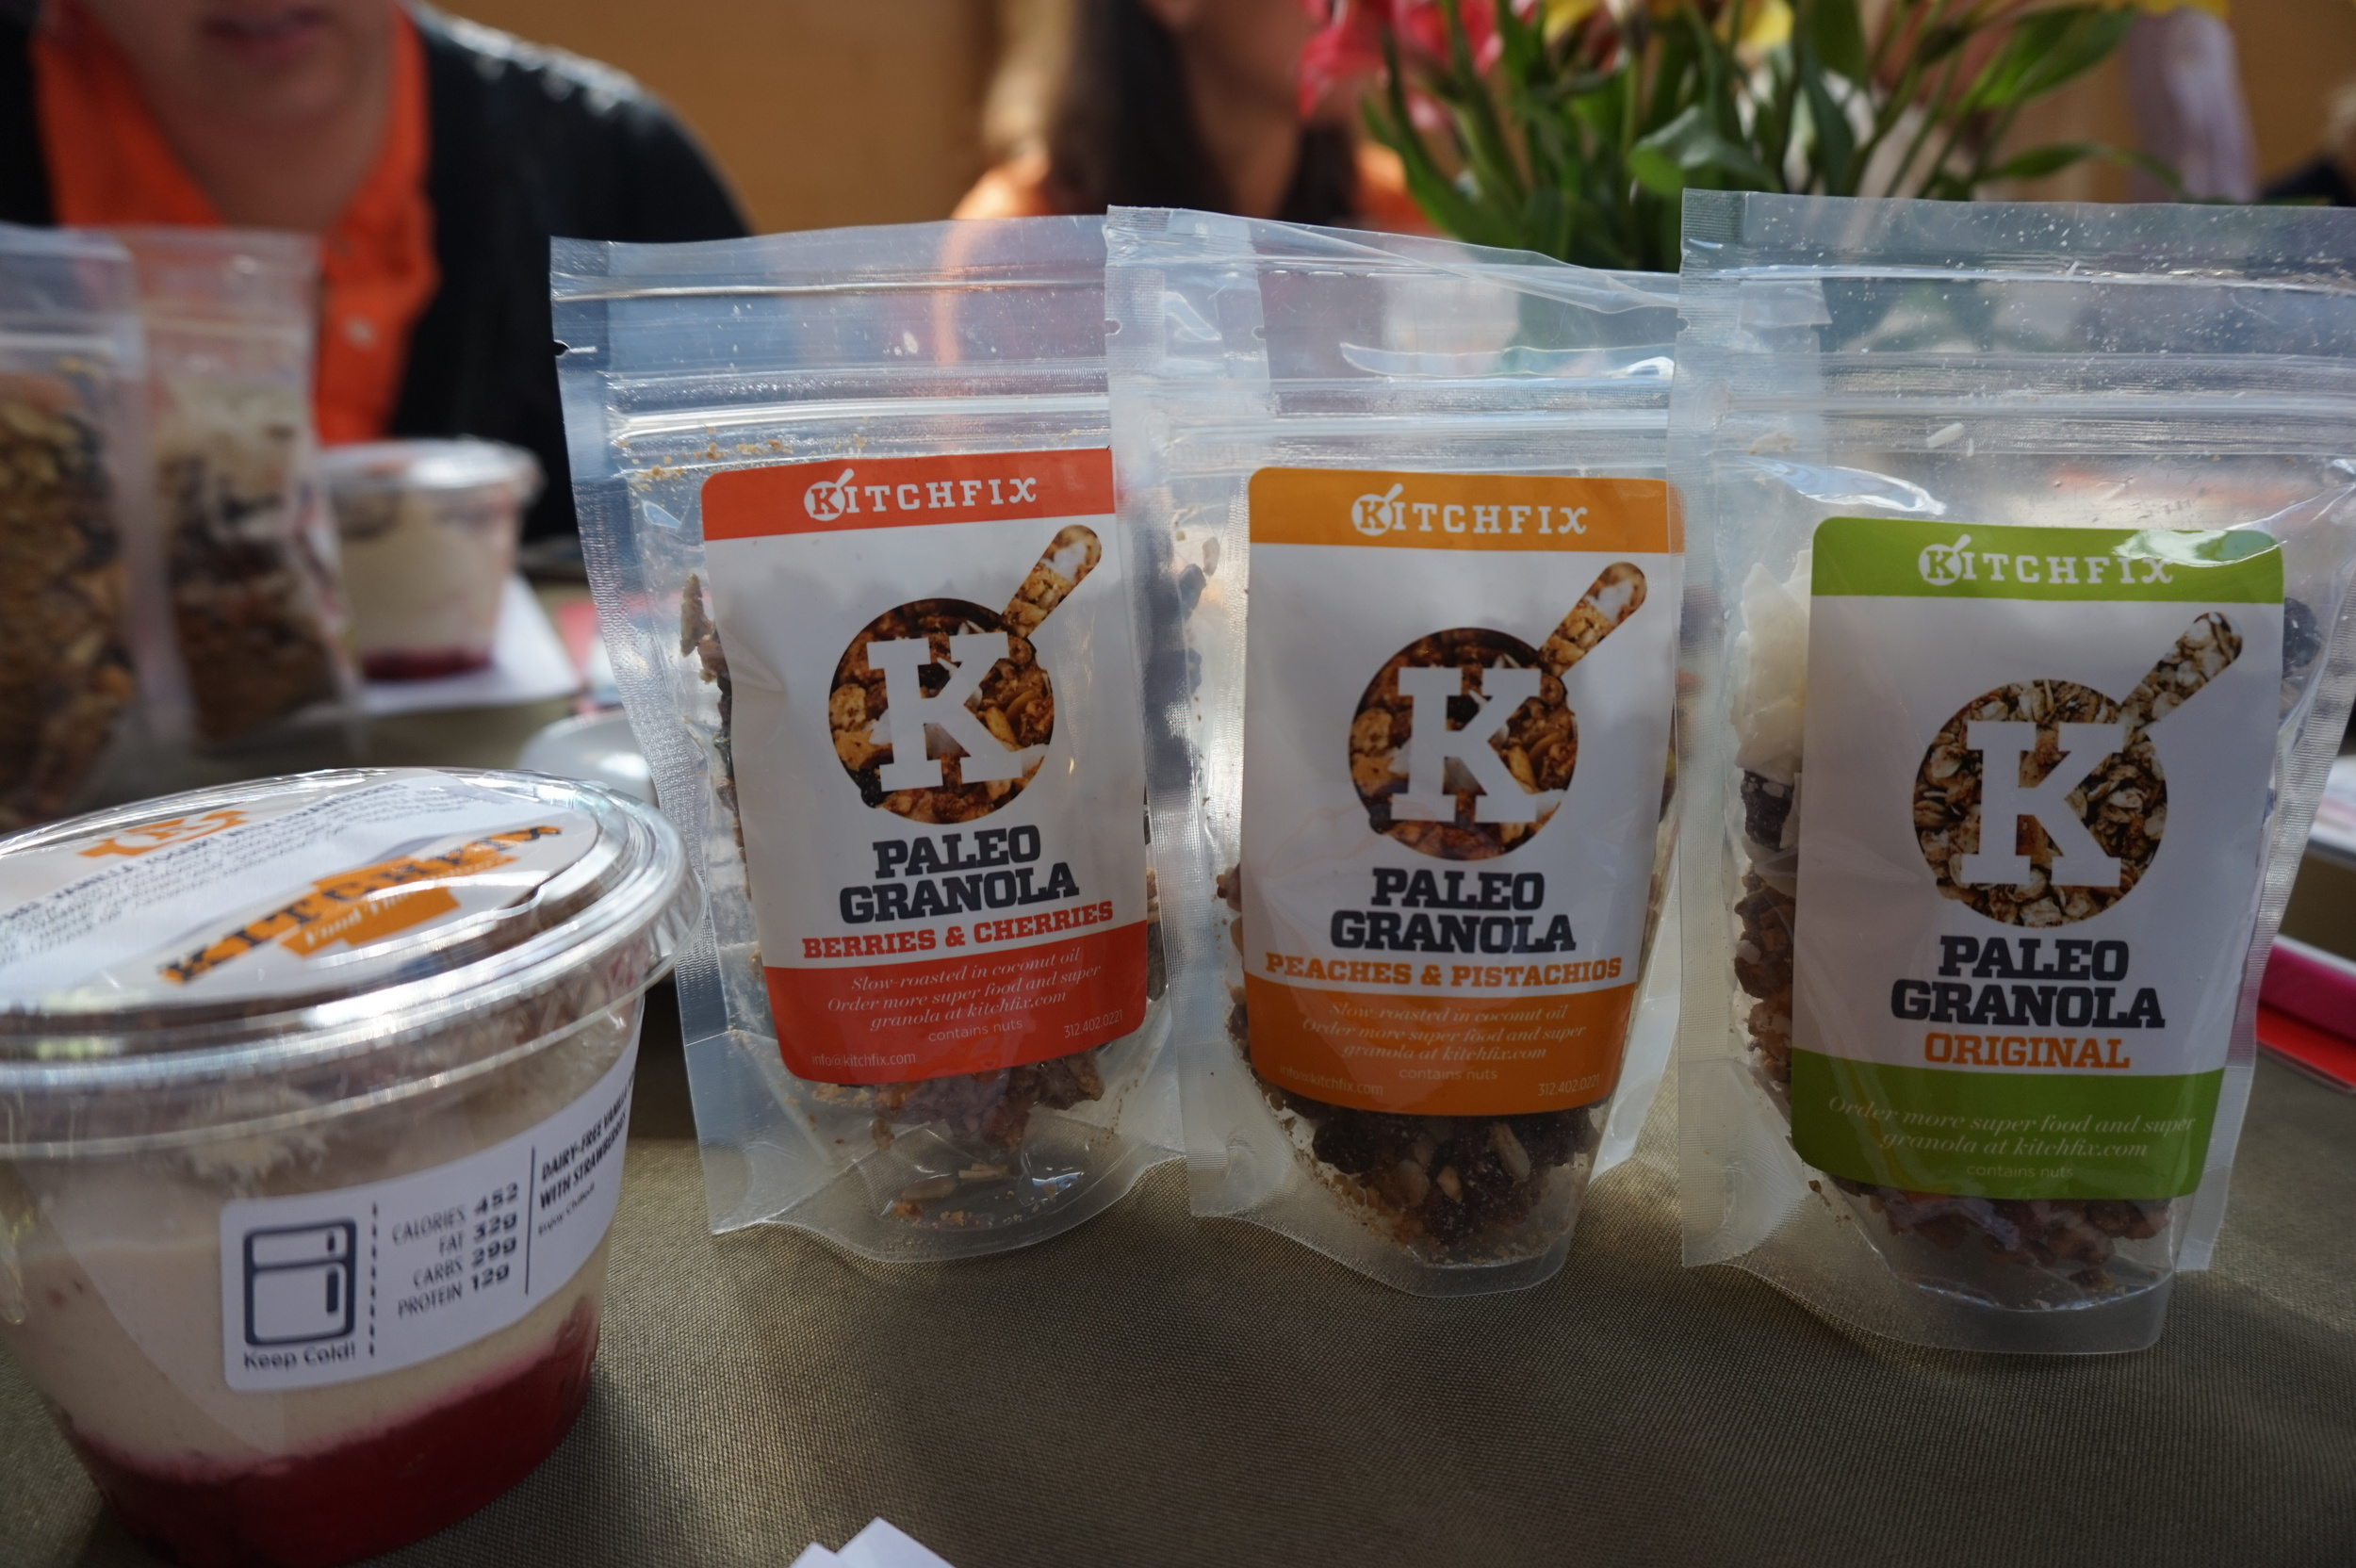 foodseum kitchn fix granola